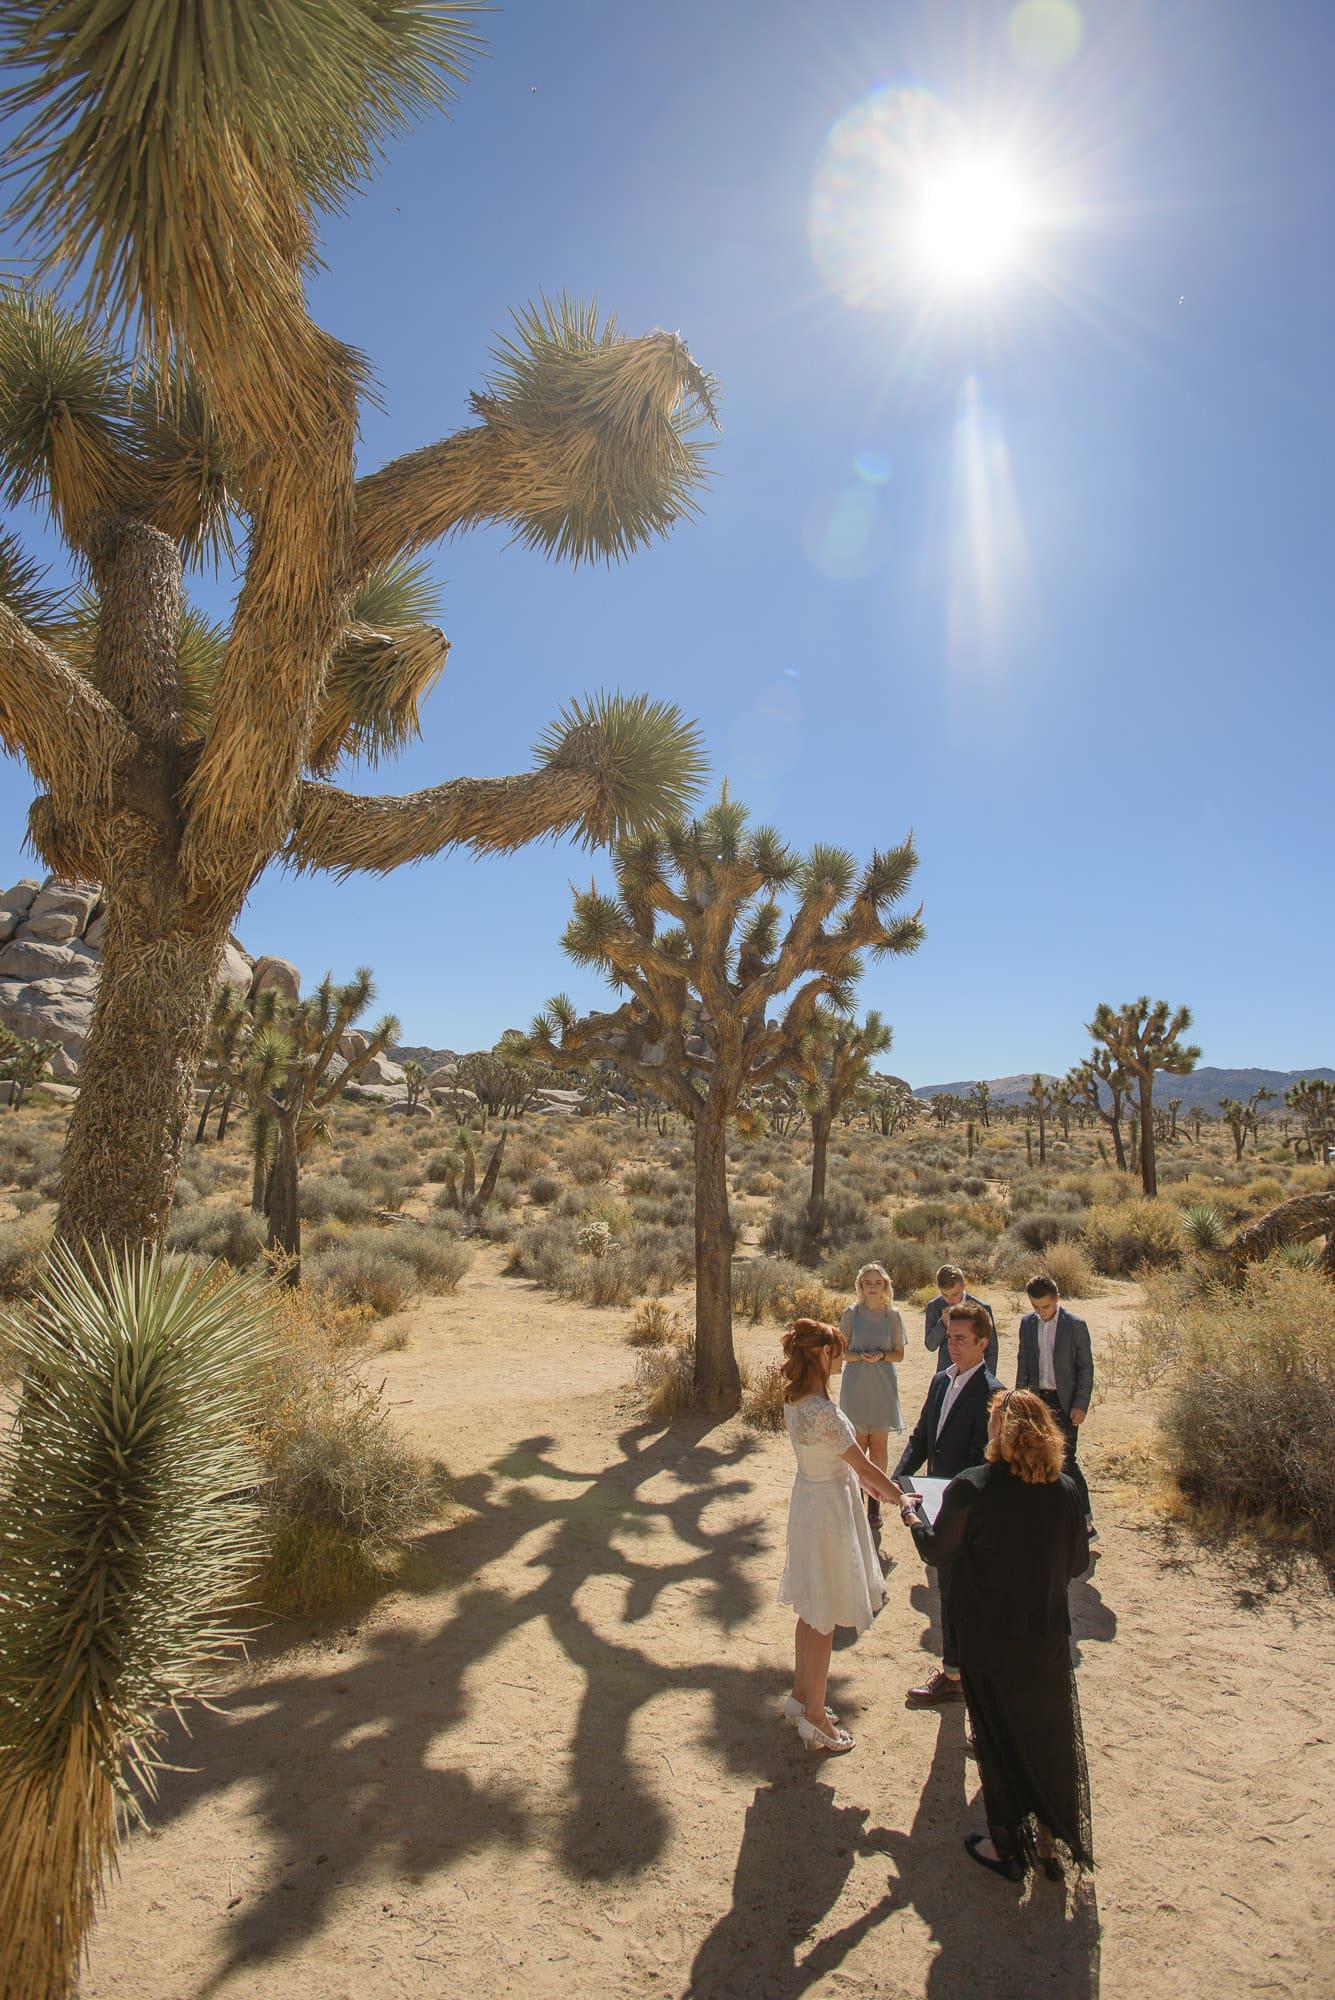 003_Alan_and_Heidi_Joshua_Tree_Destination_Wedding